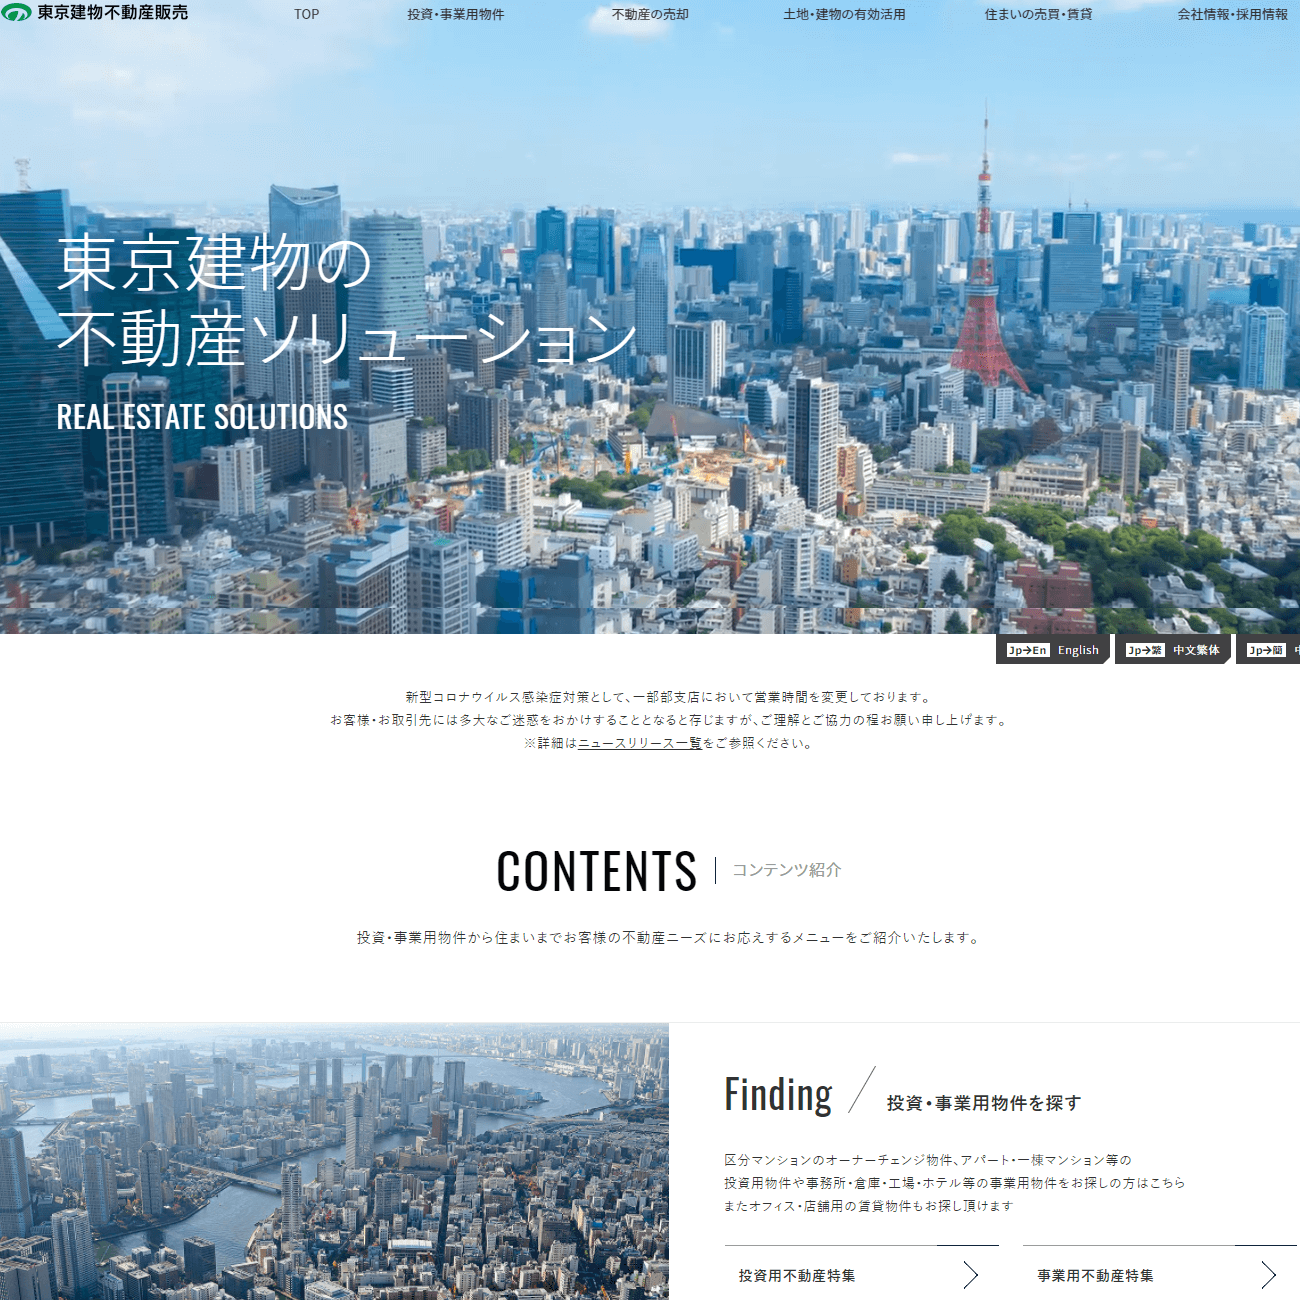 "<span class=""title"">東京建物不動産販売株式会社の口コミや評判</span>"